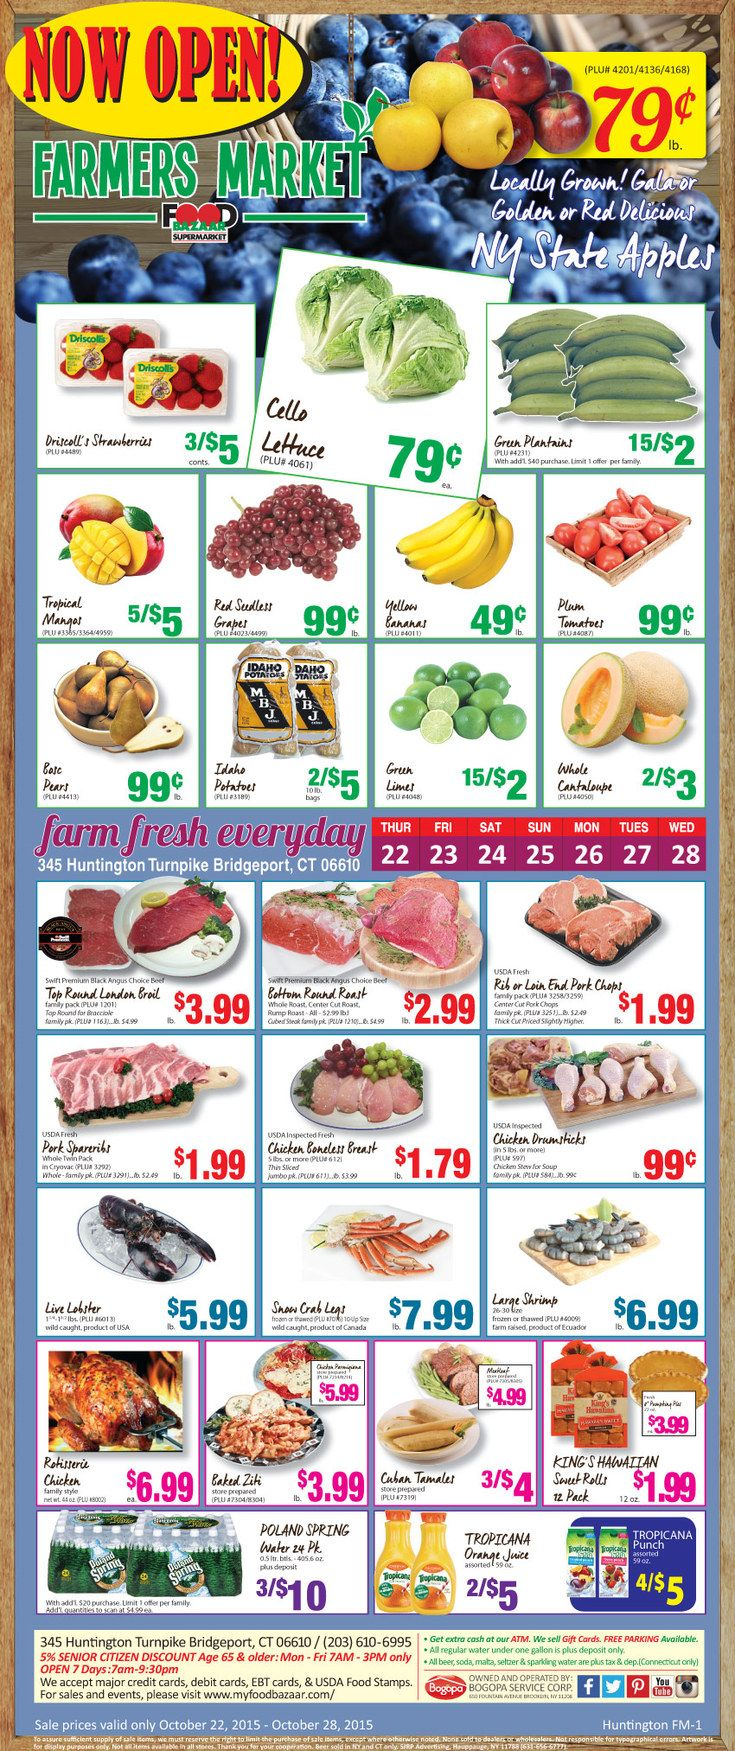 Food bazaar circular october 22 28 2015 httpwww